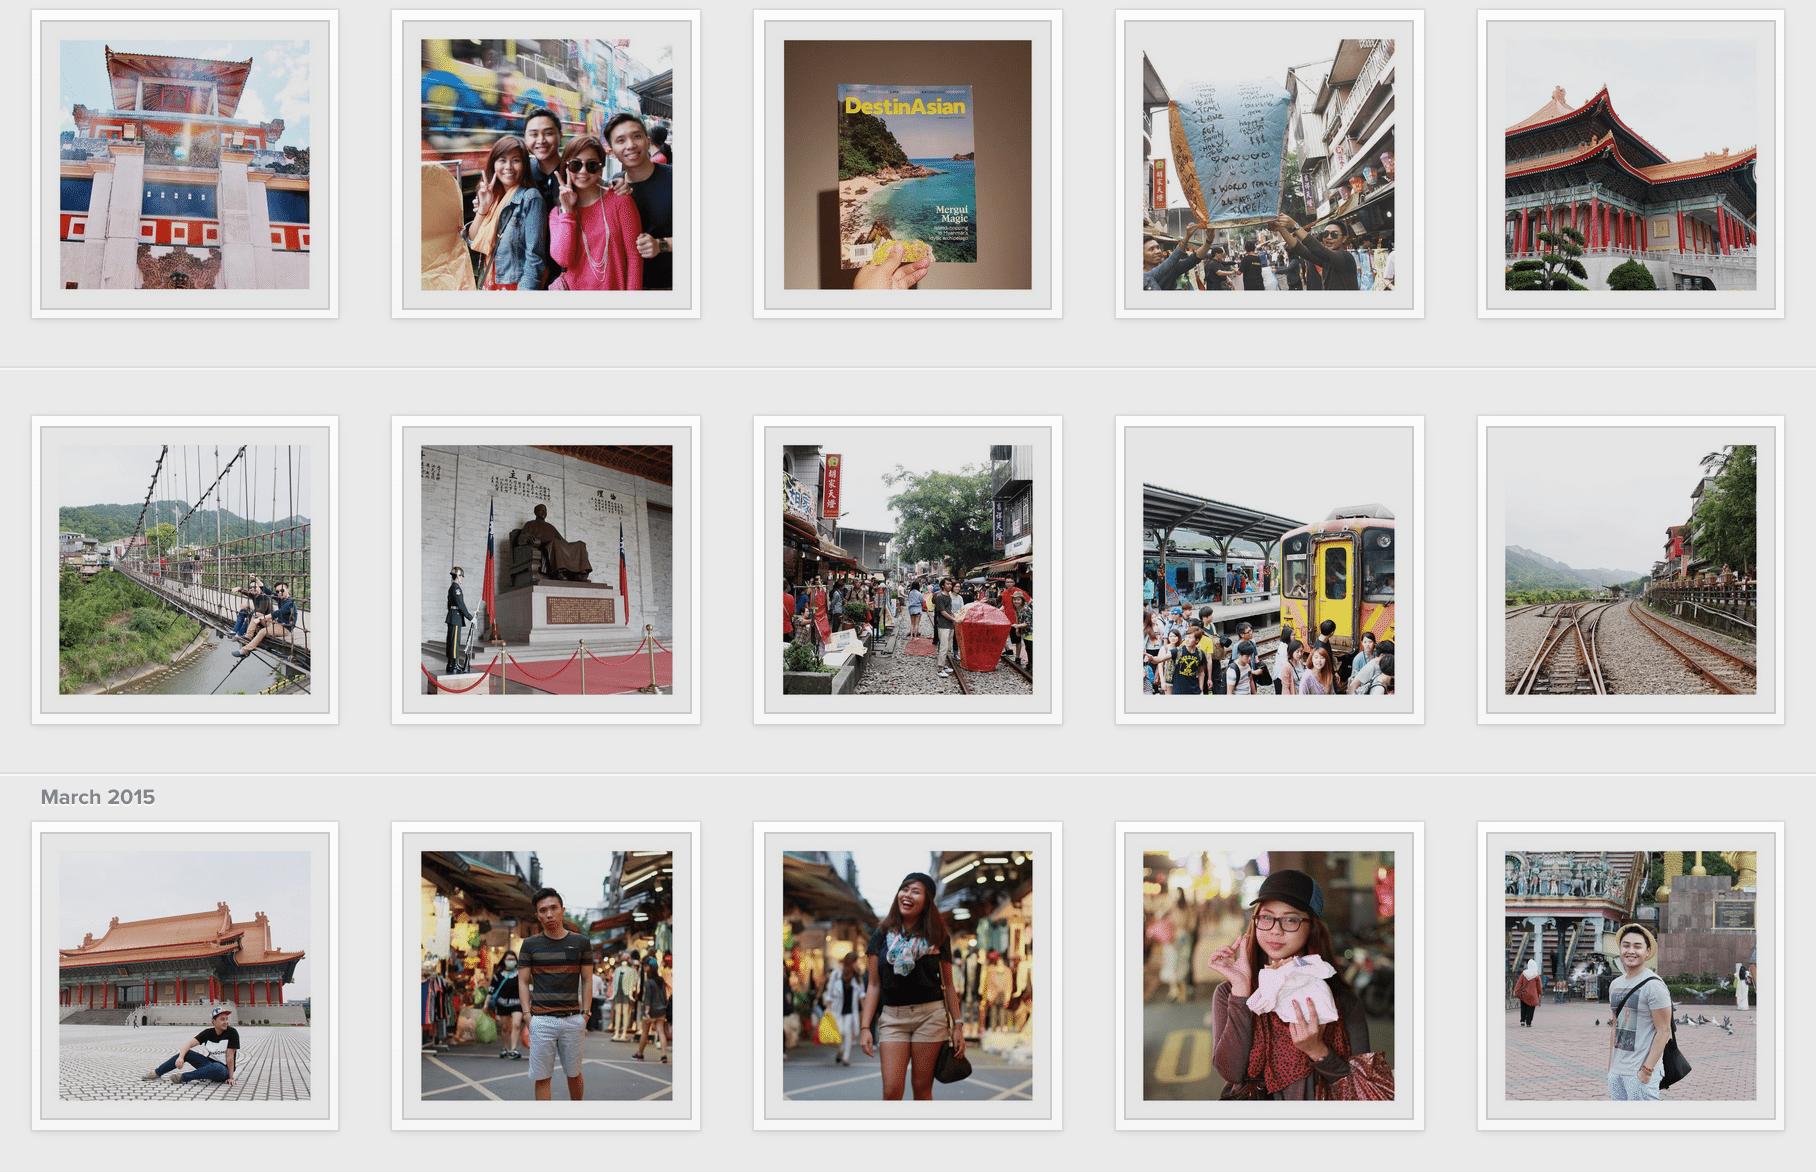 travel photos on Instagram